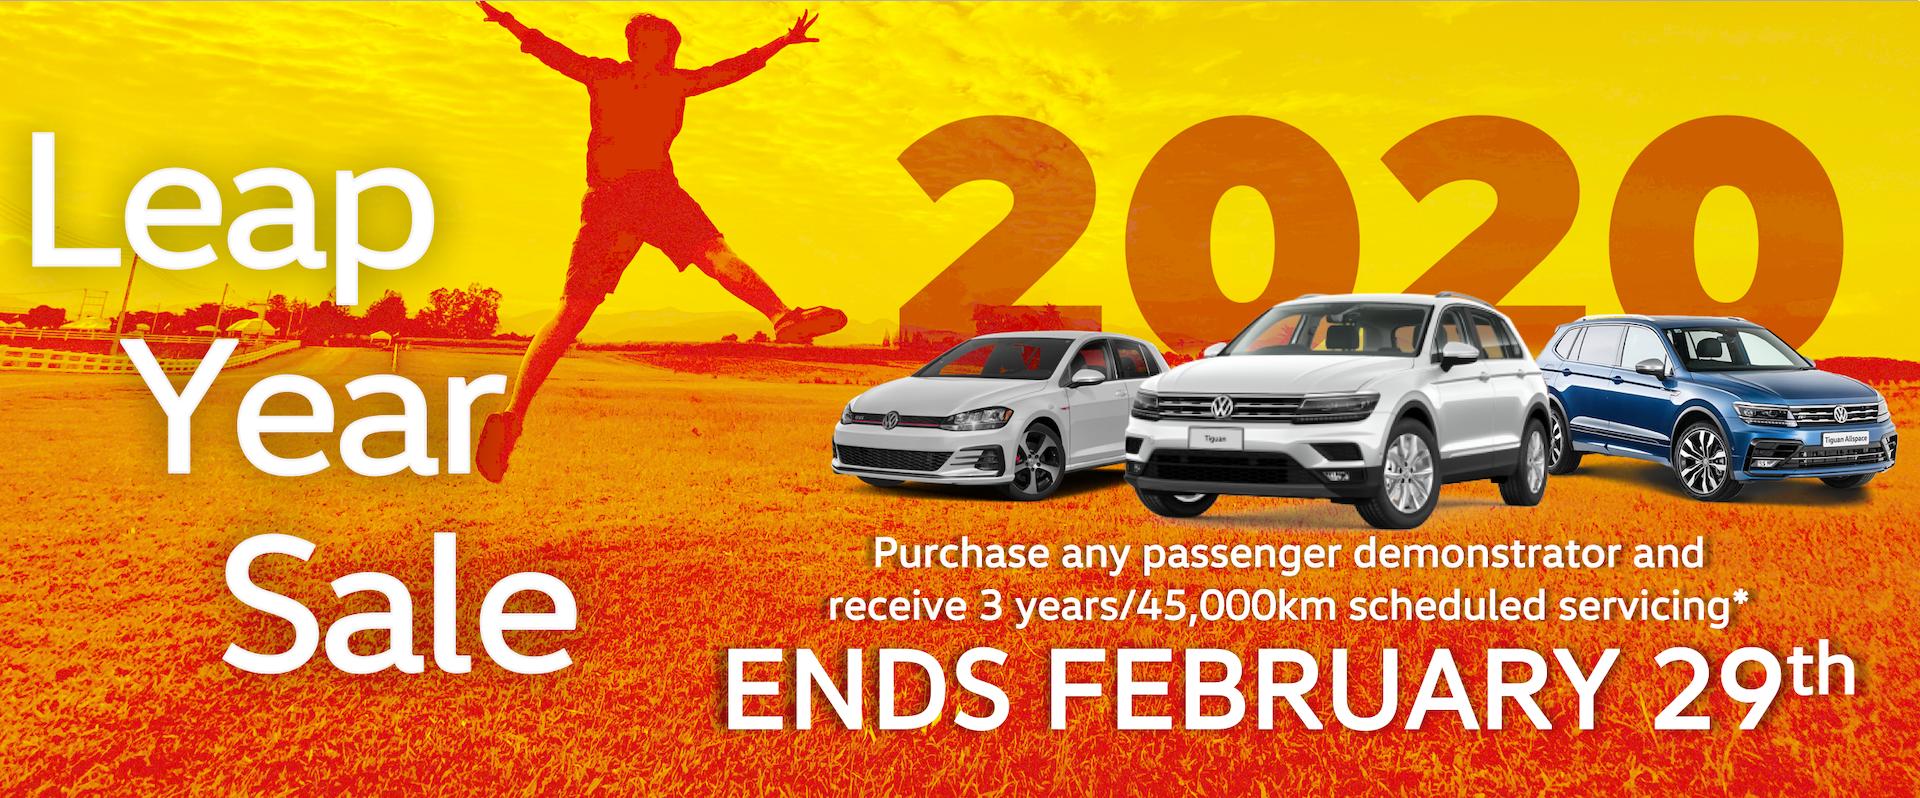 Leap year sale